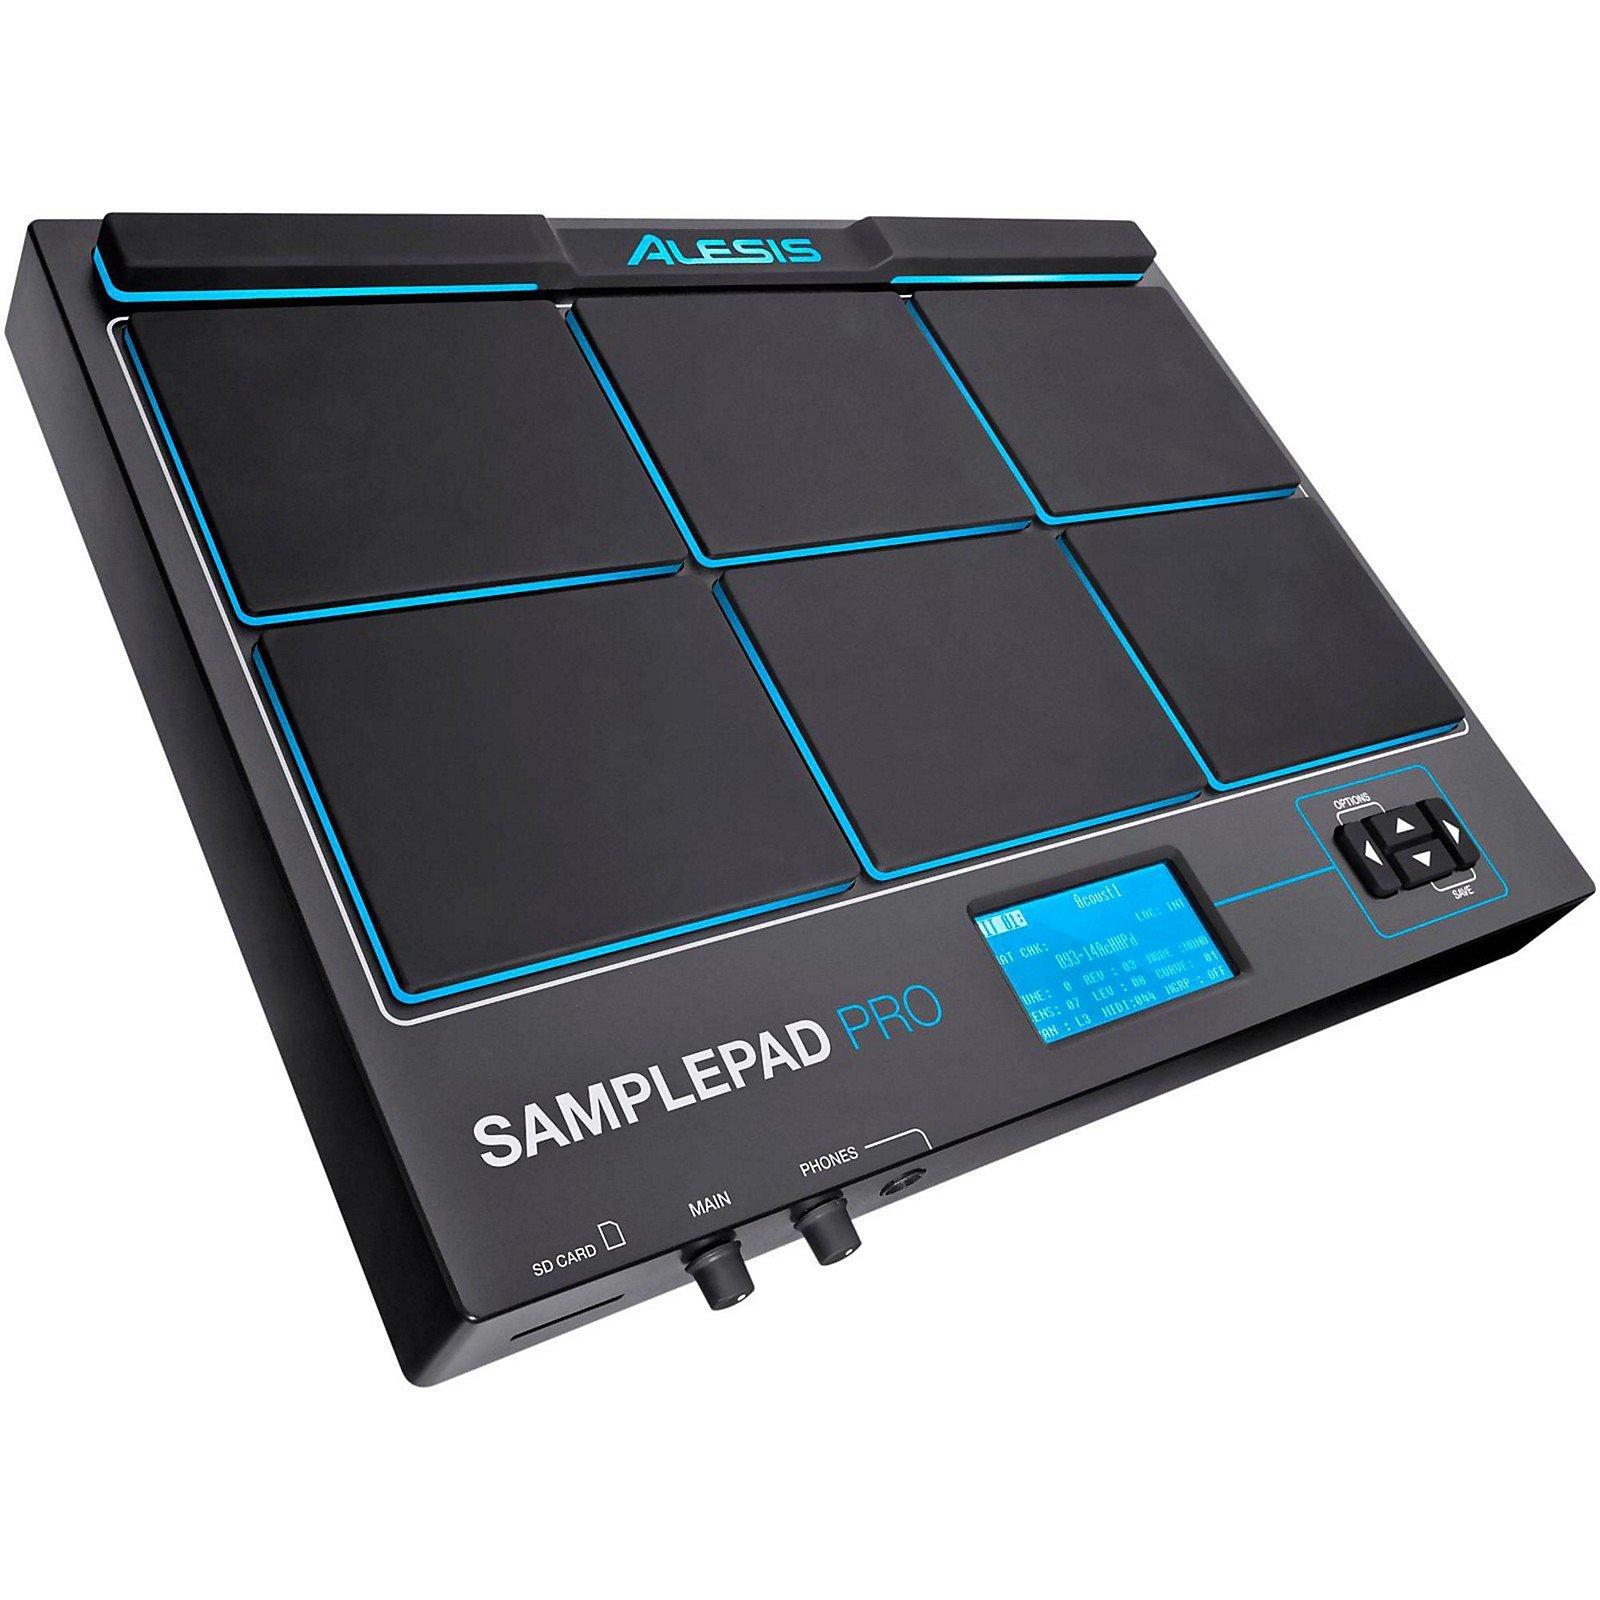 Alesis Sample Pad Pro 8-Pad Percussion Pad